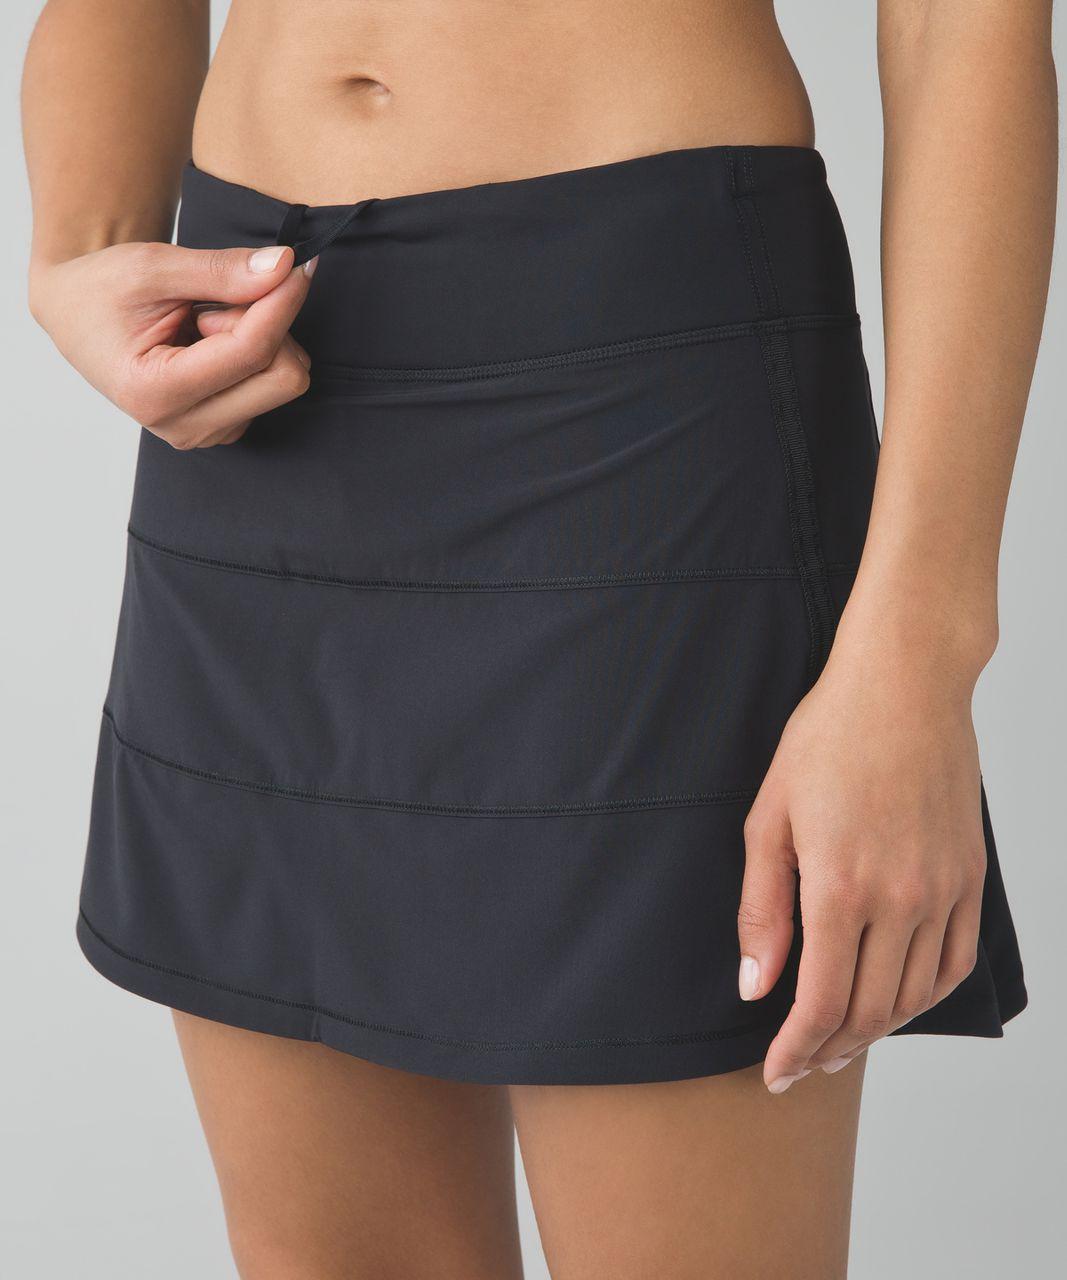 Lululemon Pace Rival Skirt II (Tall) - Black